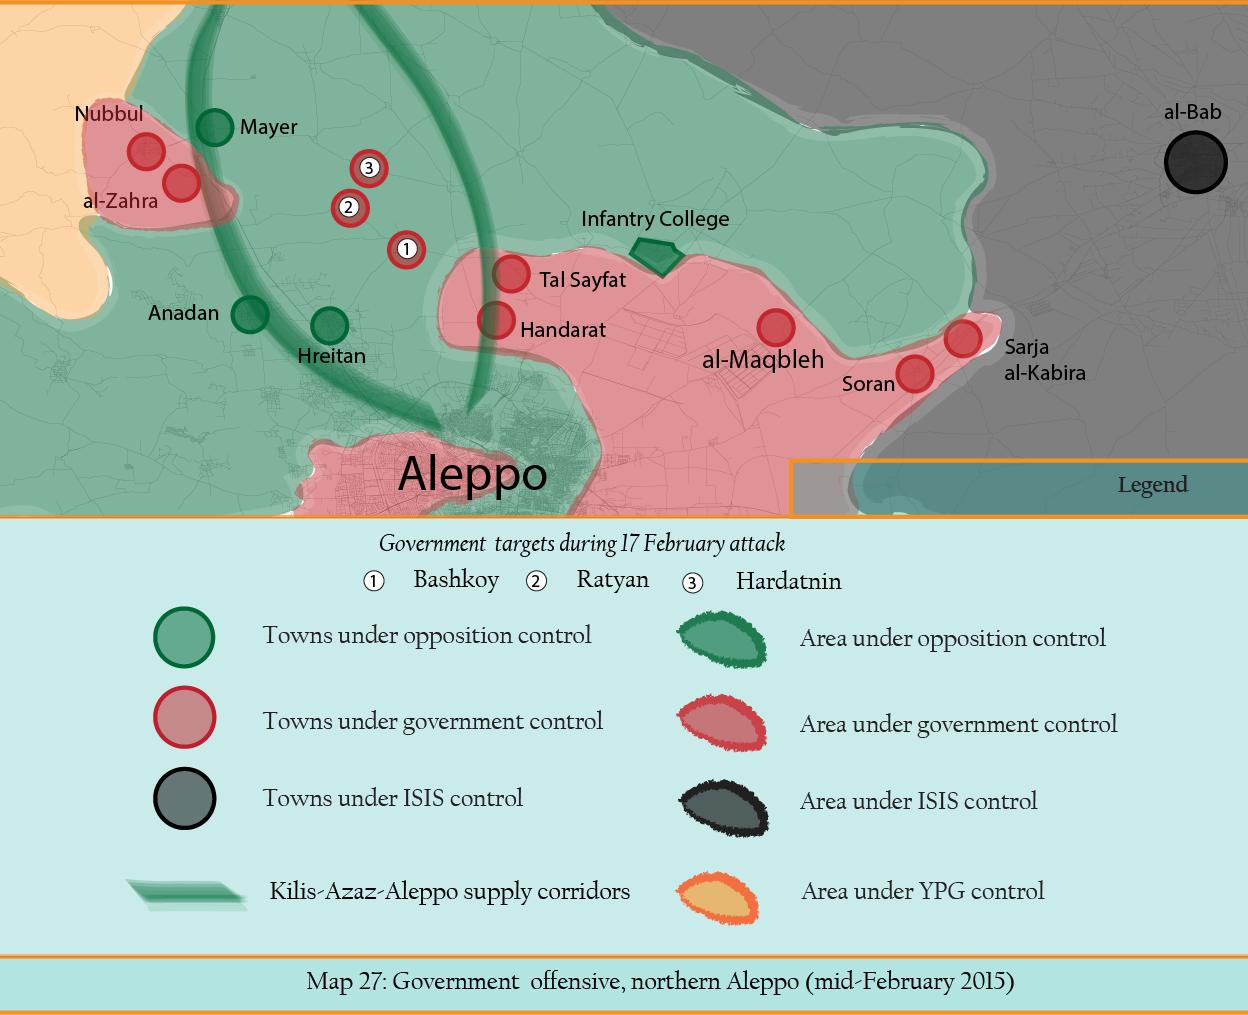 MAP 27 Govet offensive north aleppo Feb 2015